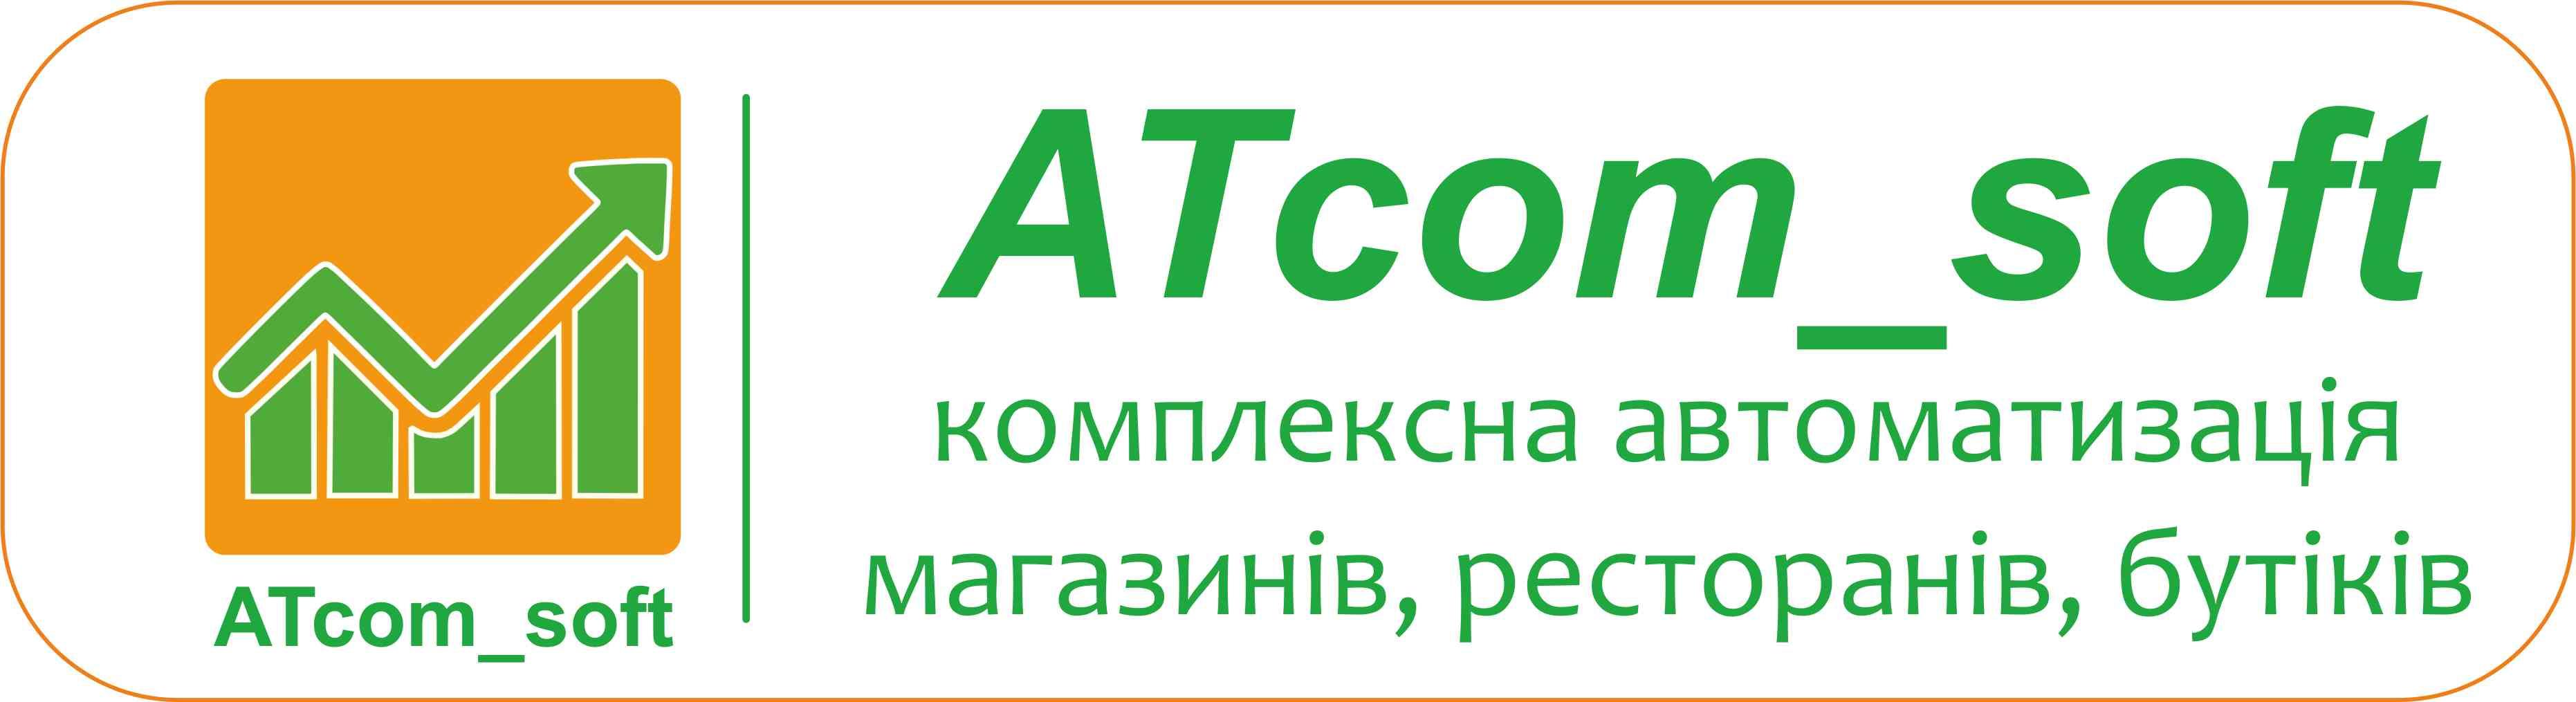 atcom_soft